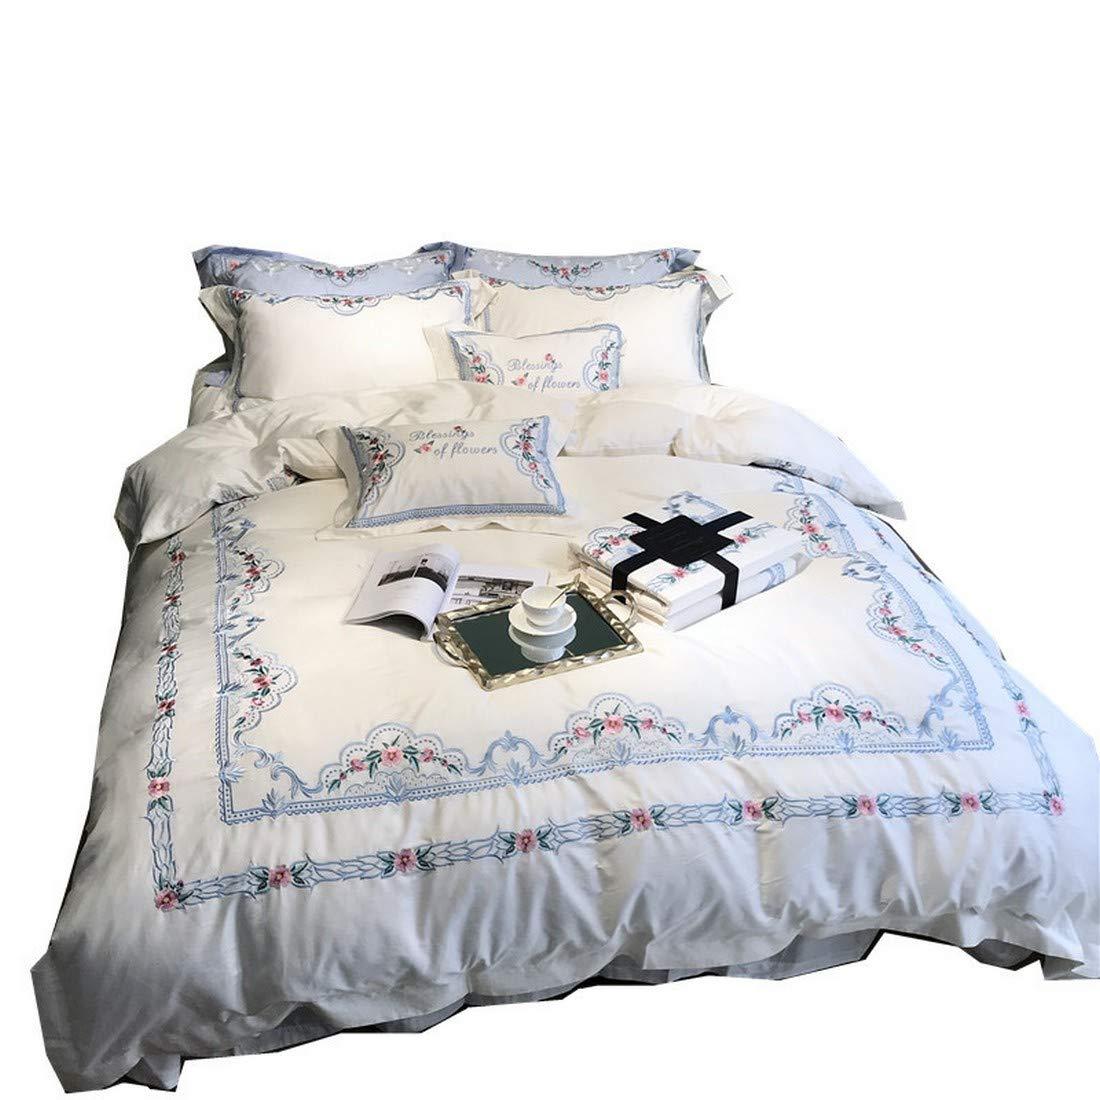 Kainuoo 高精度刺繍寝具ピュアコットン寝具セット (Size : QUEEN) B07N6QSJV7  Queen